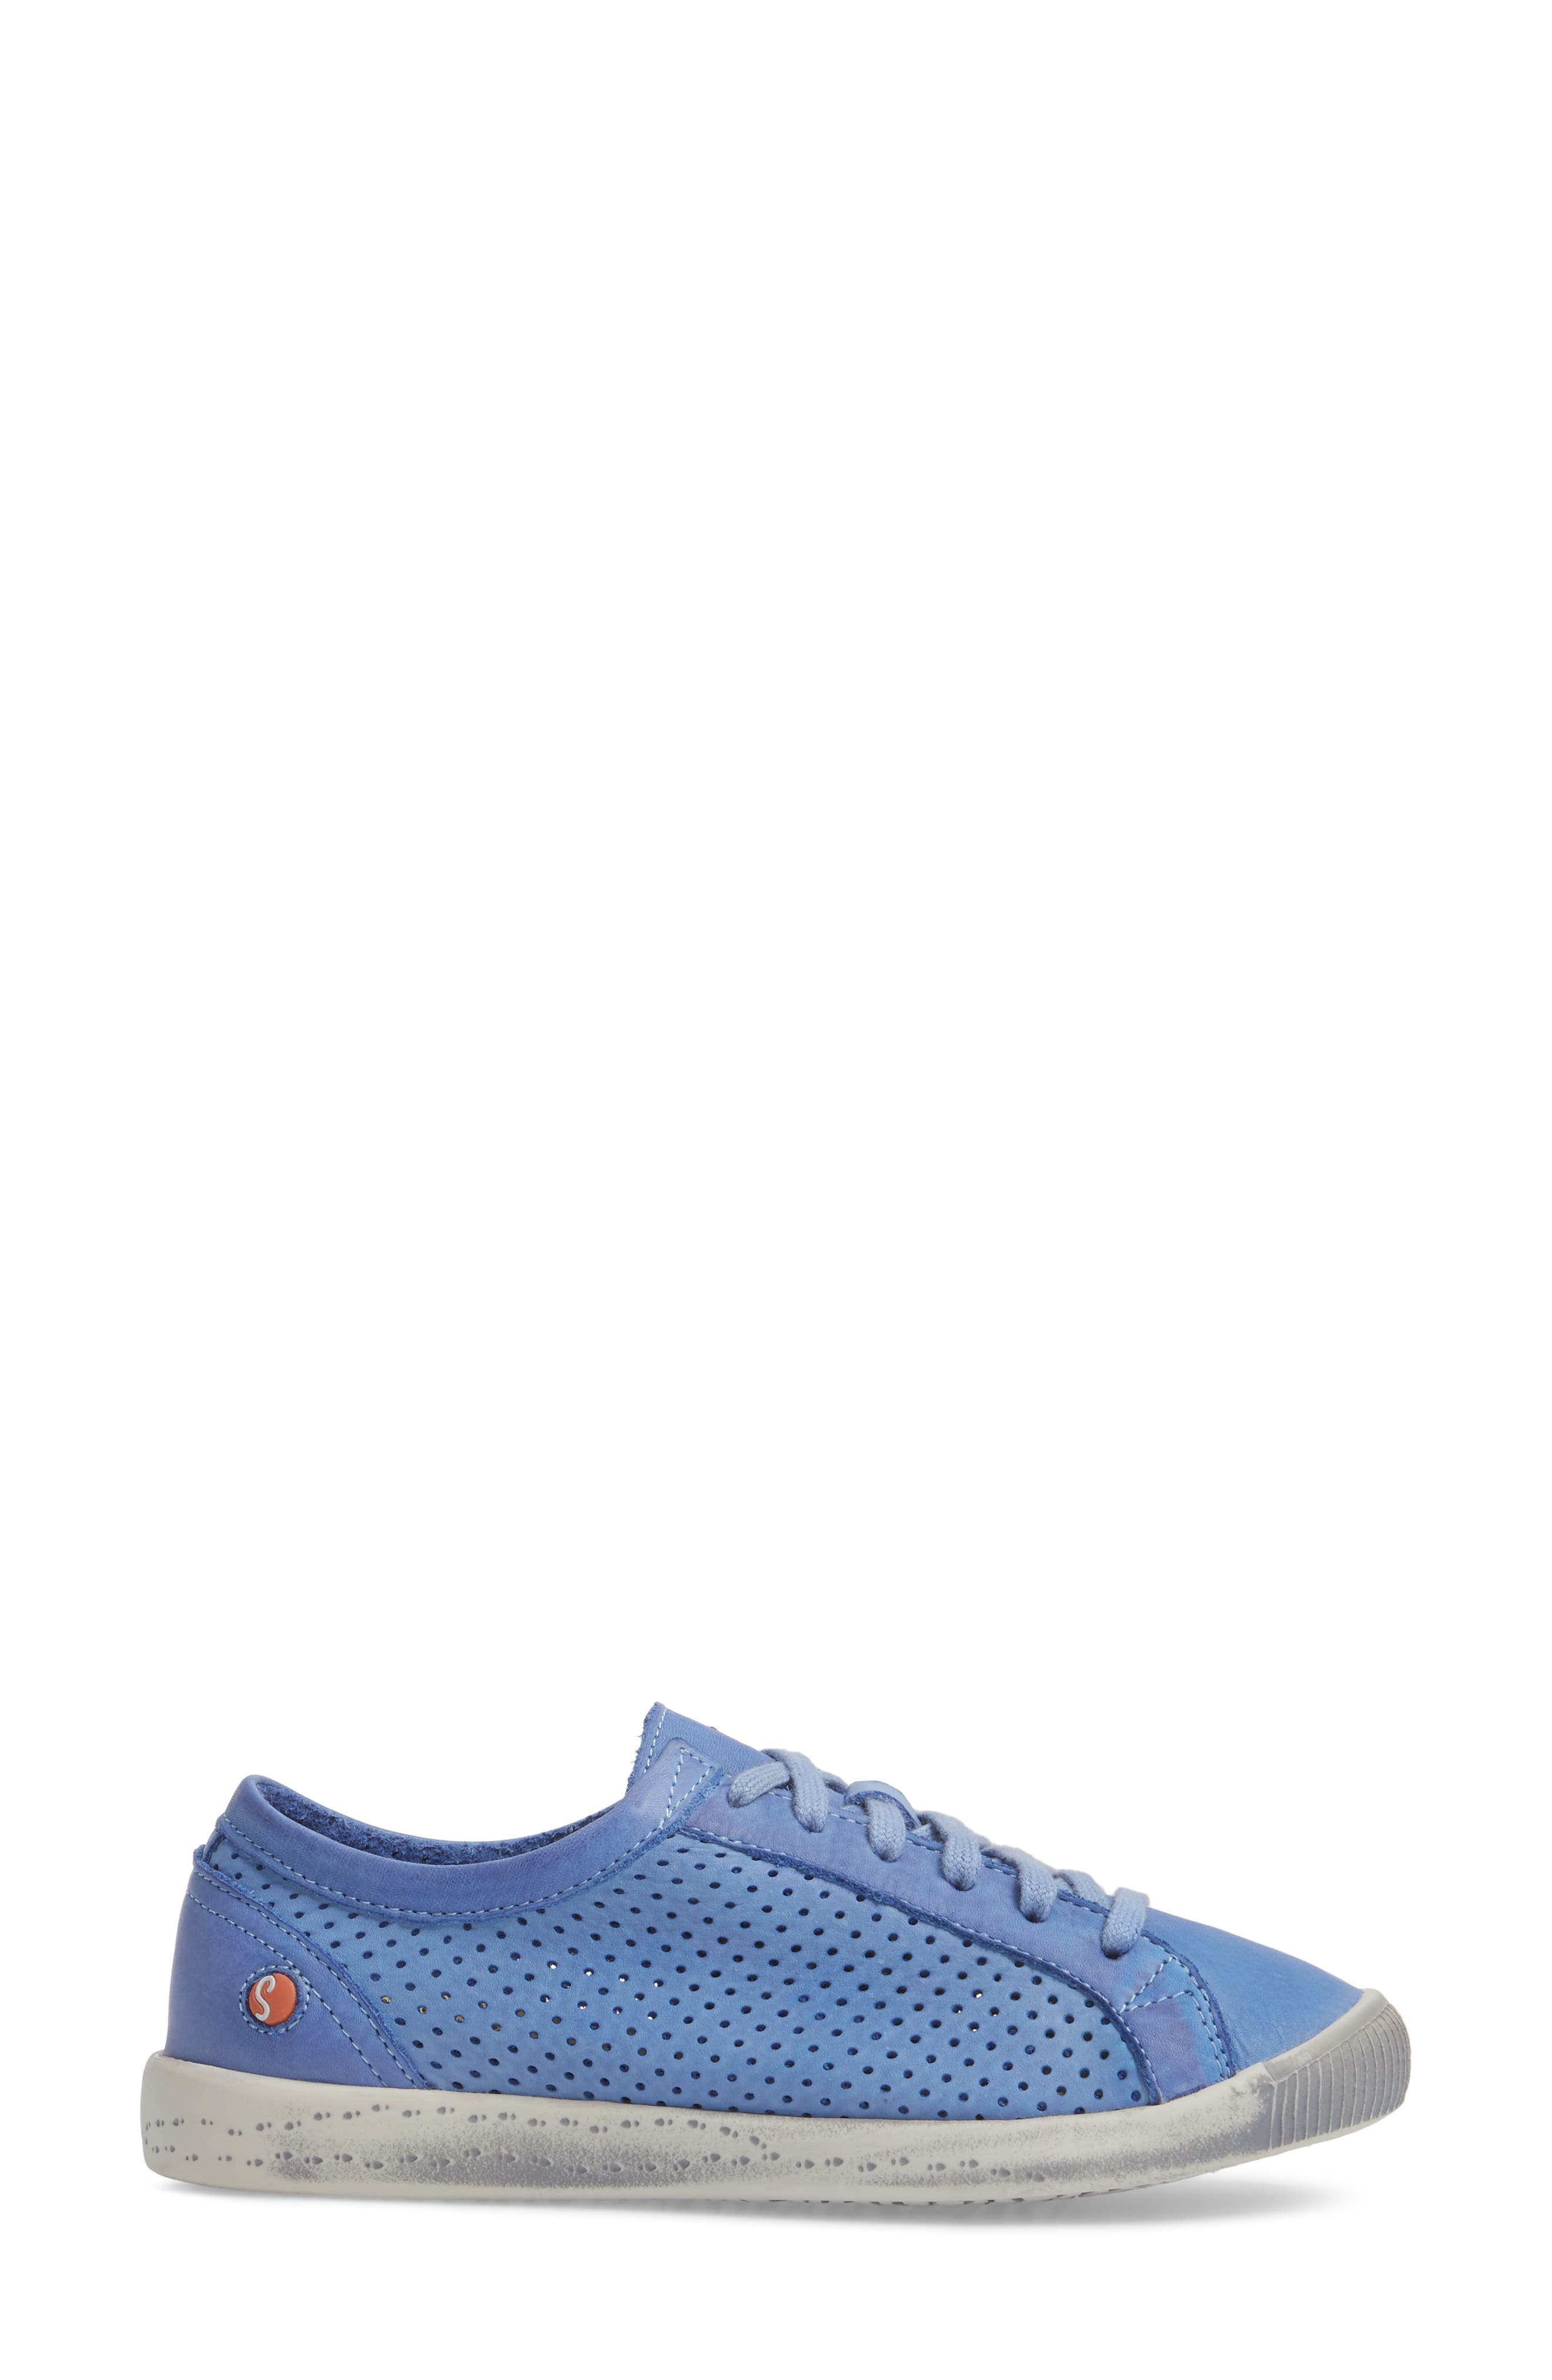 Ica Sneaker,                             Alternate thumbnail 19, color,